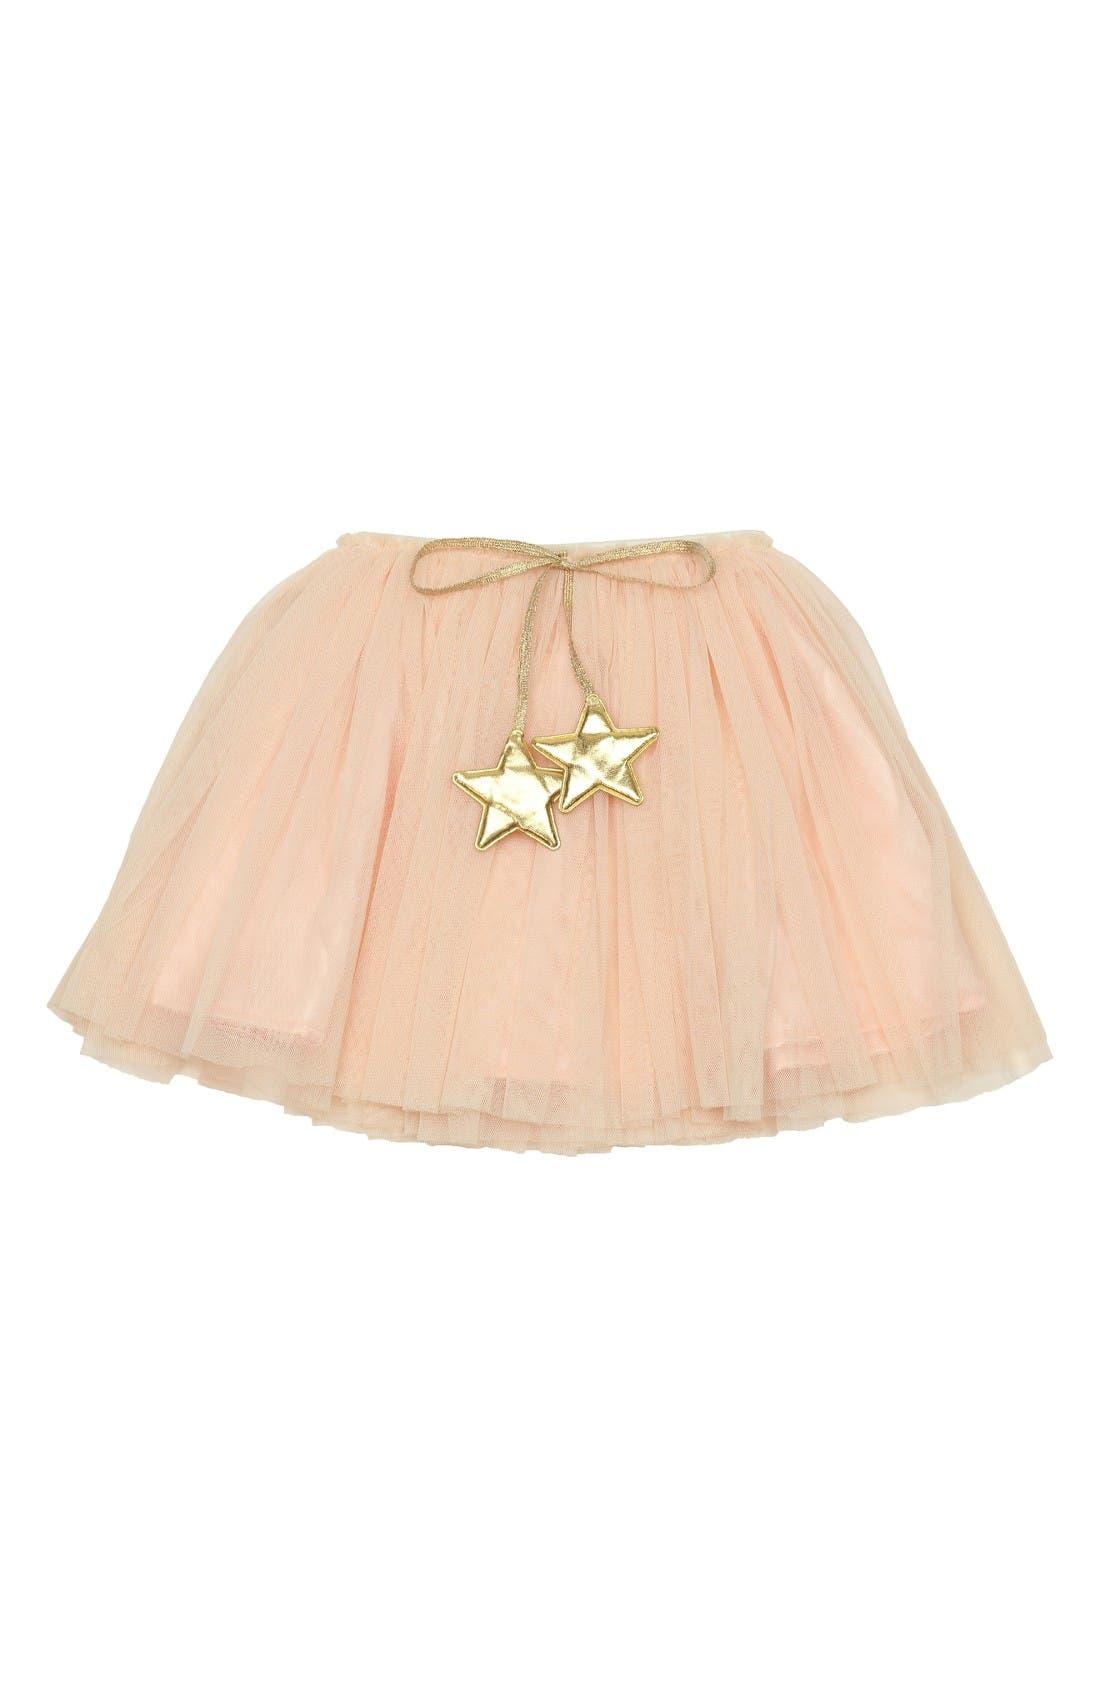 Gold Star Tutu Skirt,                         Main,                         color, Peach